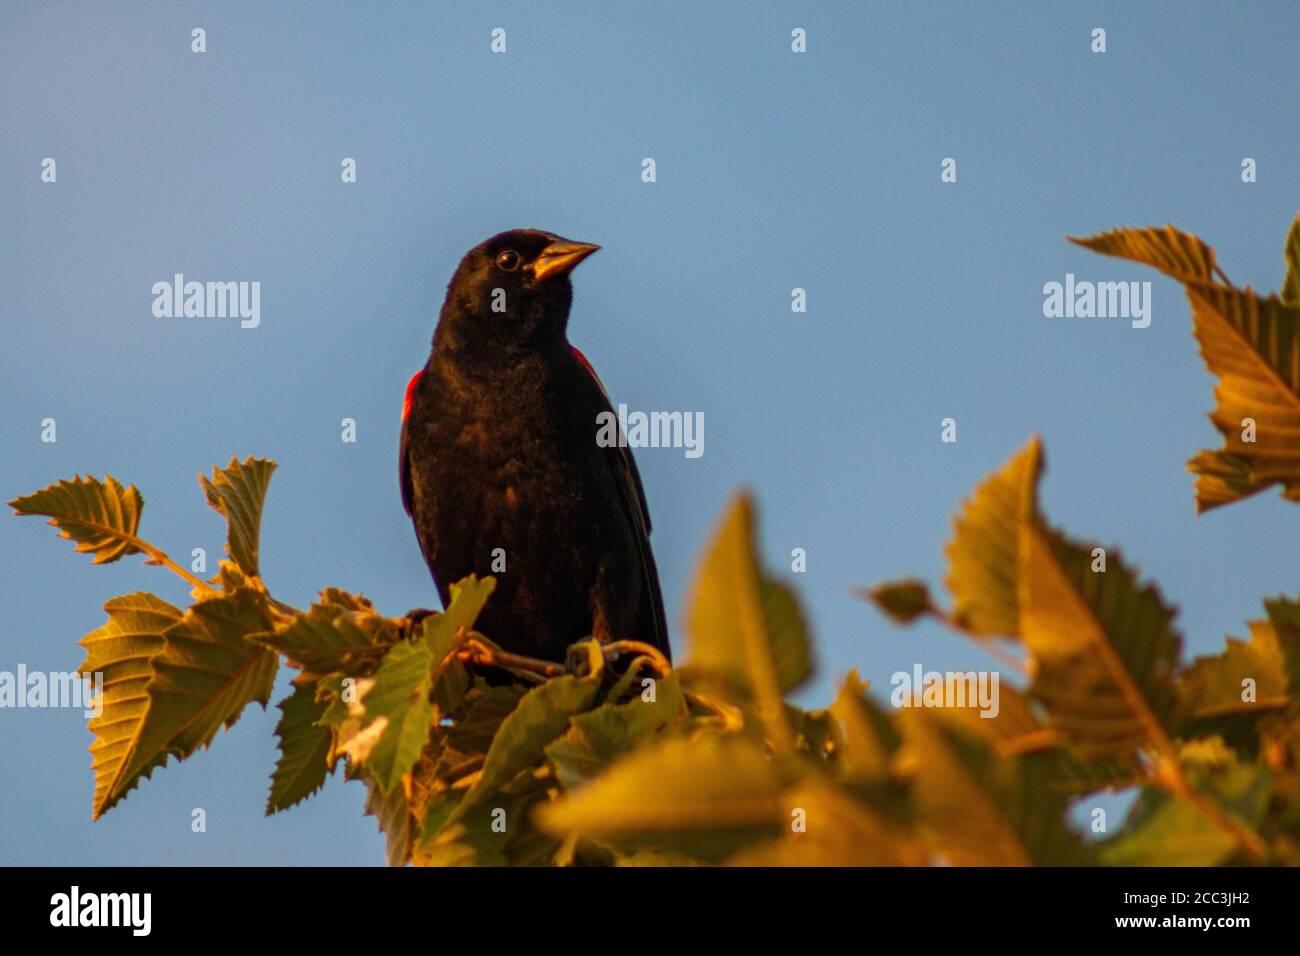 Red-winged blackbird sitting in tree at Mercy Park in Joplin, MO Stock Photo